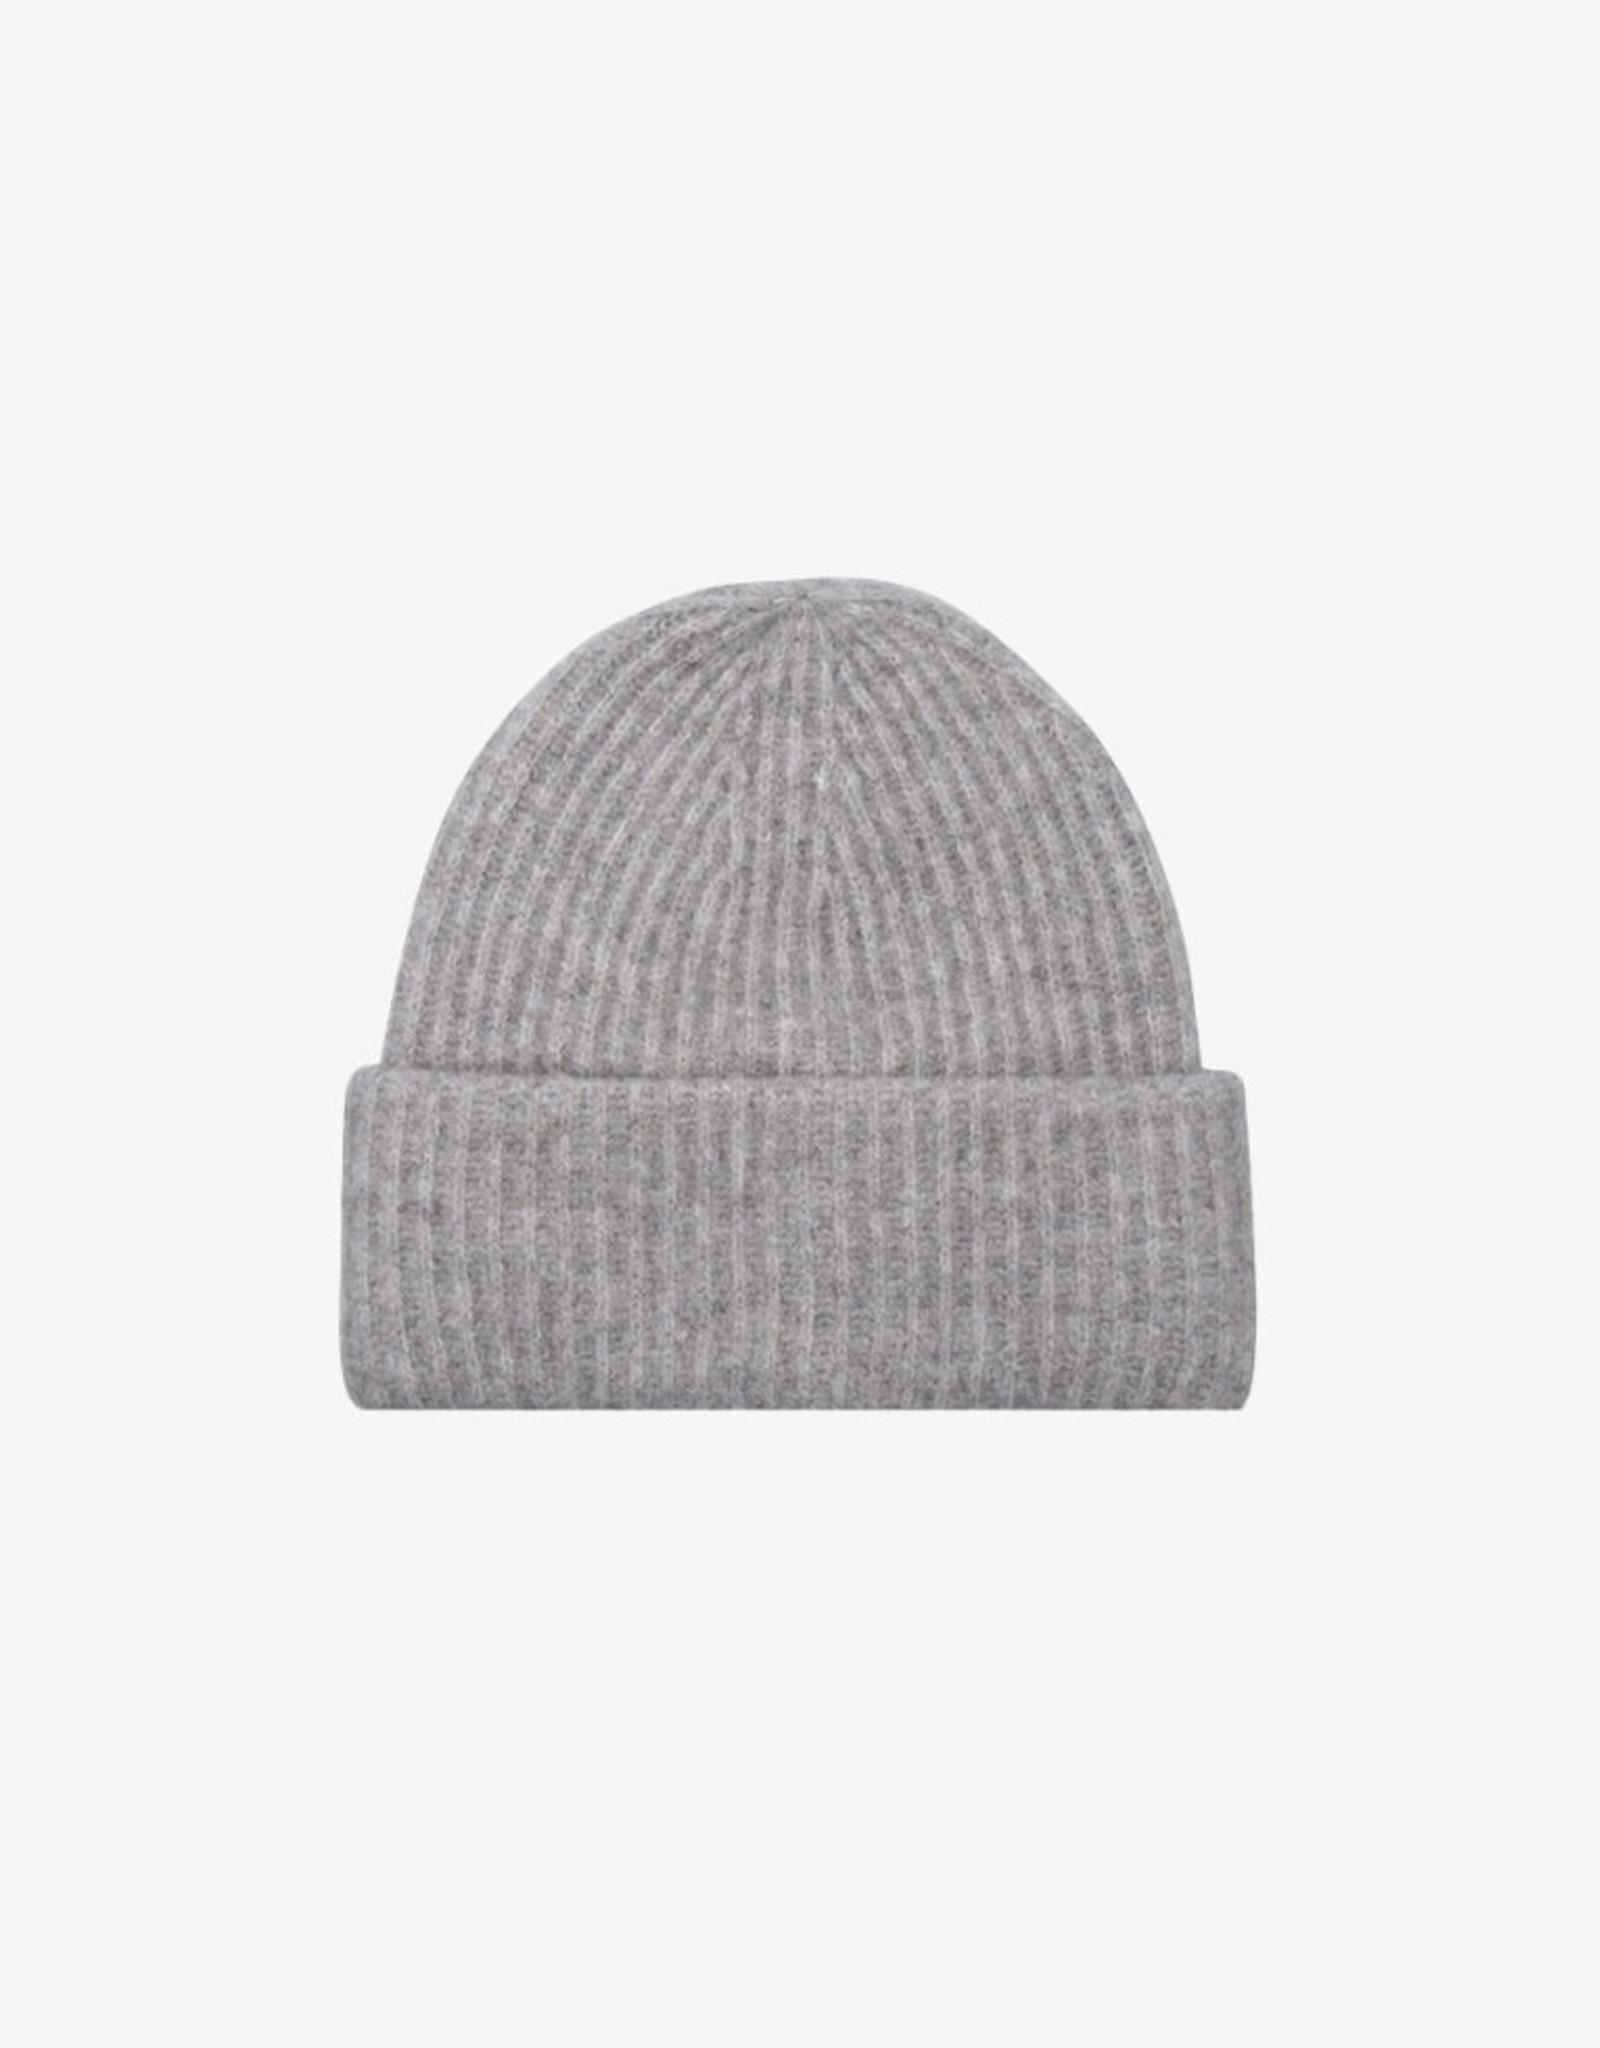 Ruby Tuesday Valora knitted beanie grey melange